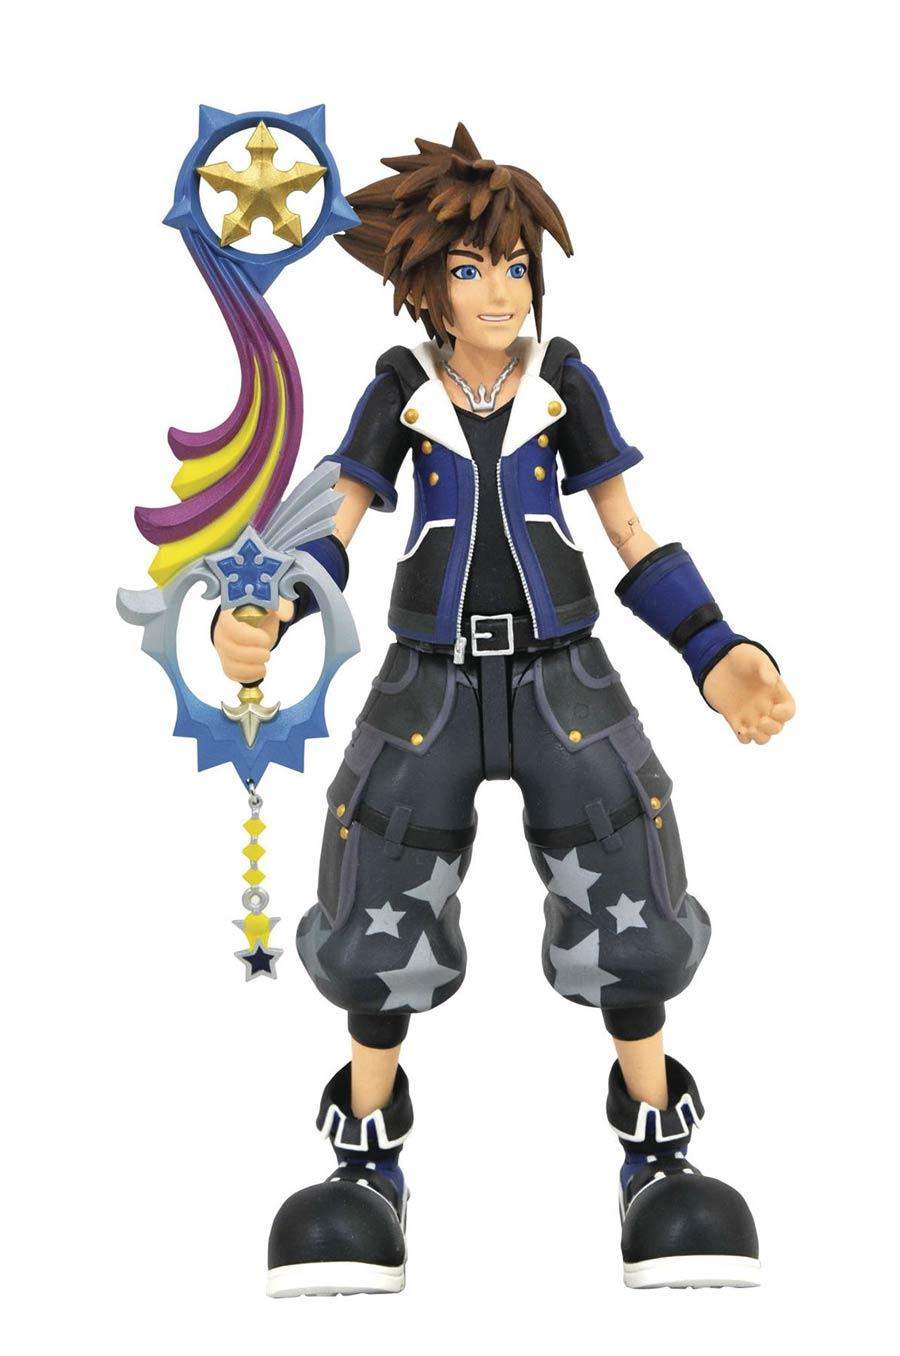 Kingdom Hearts III Wisdom Form Sora Action Figure